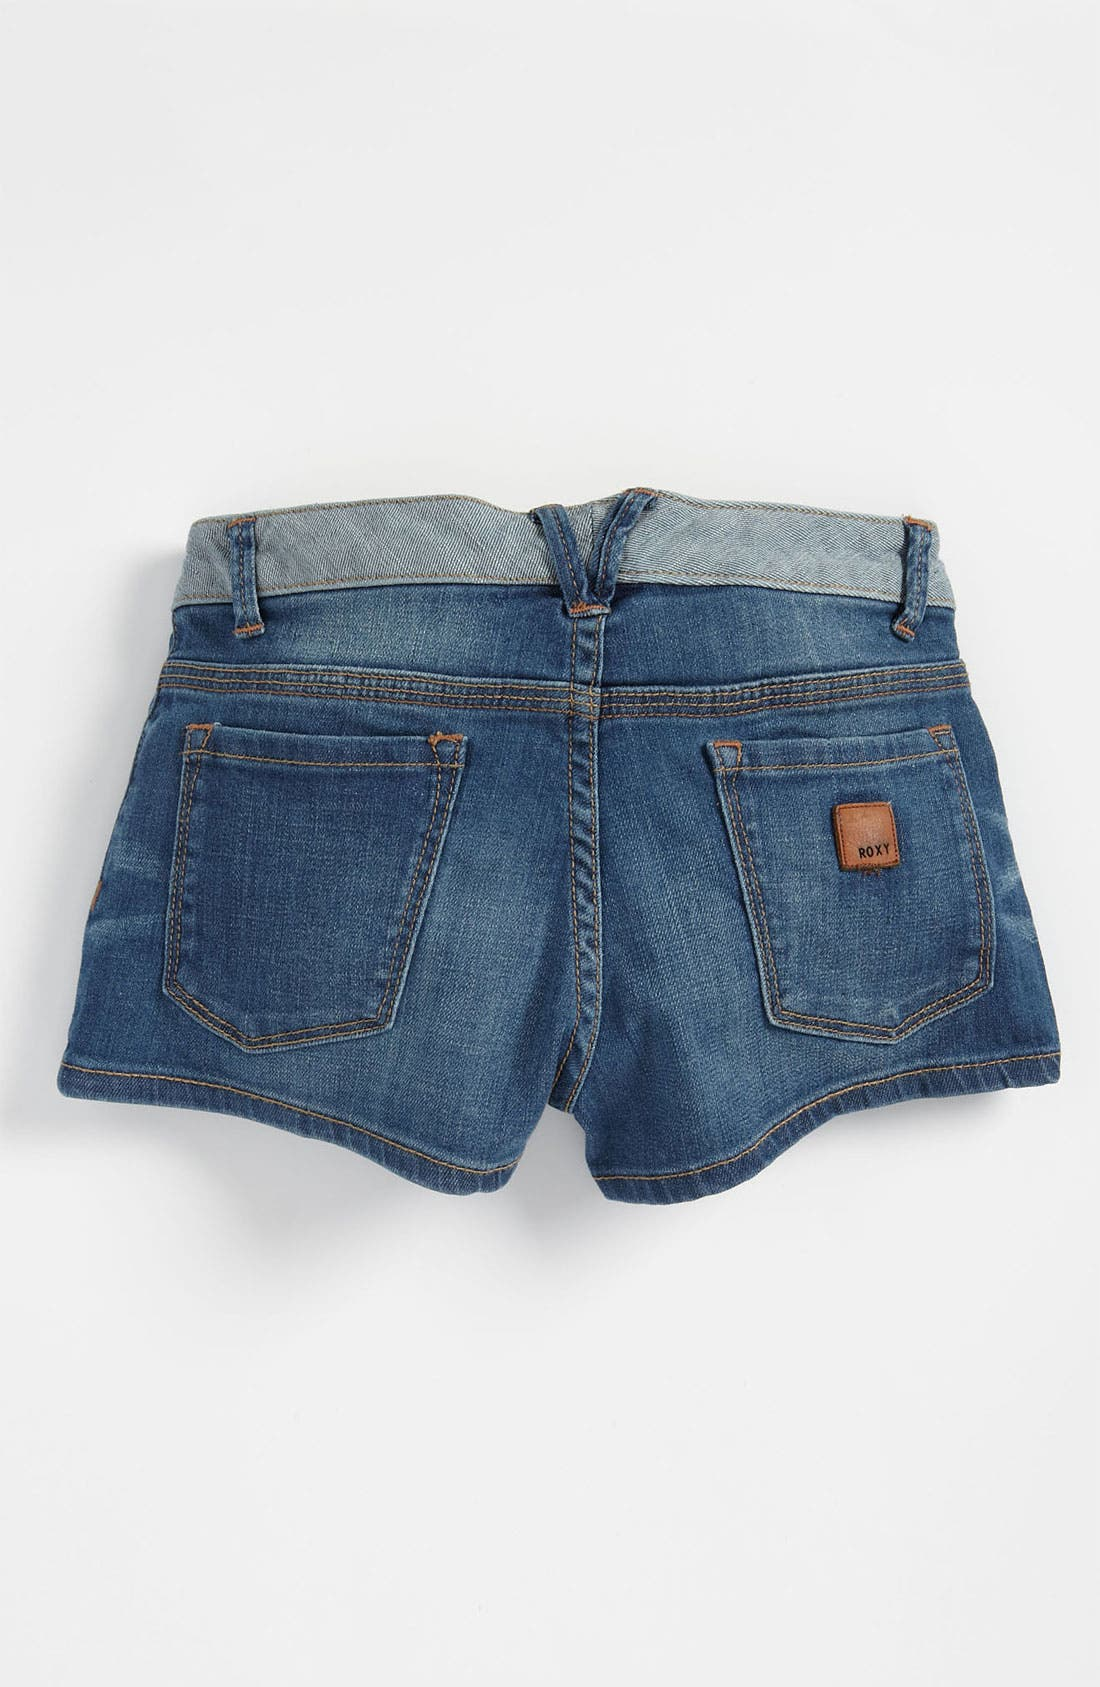 Alternate Image 1 Selected - Denim Shorts (Big Girls)